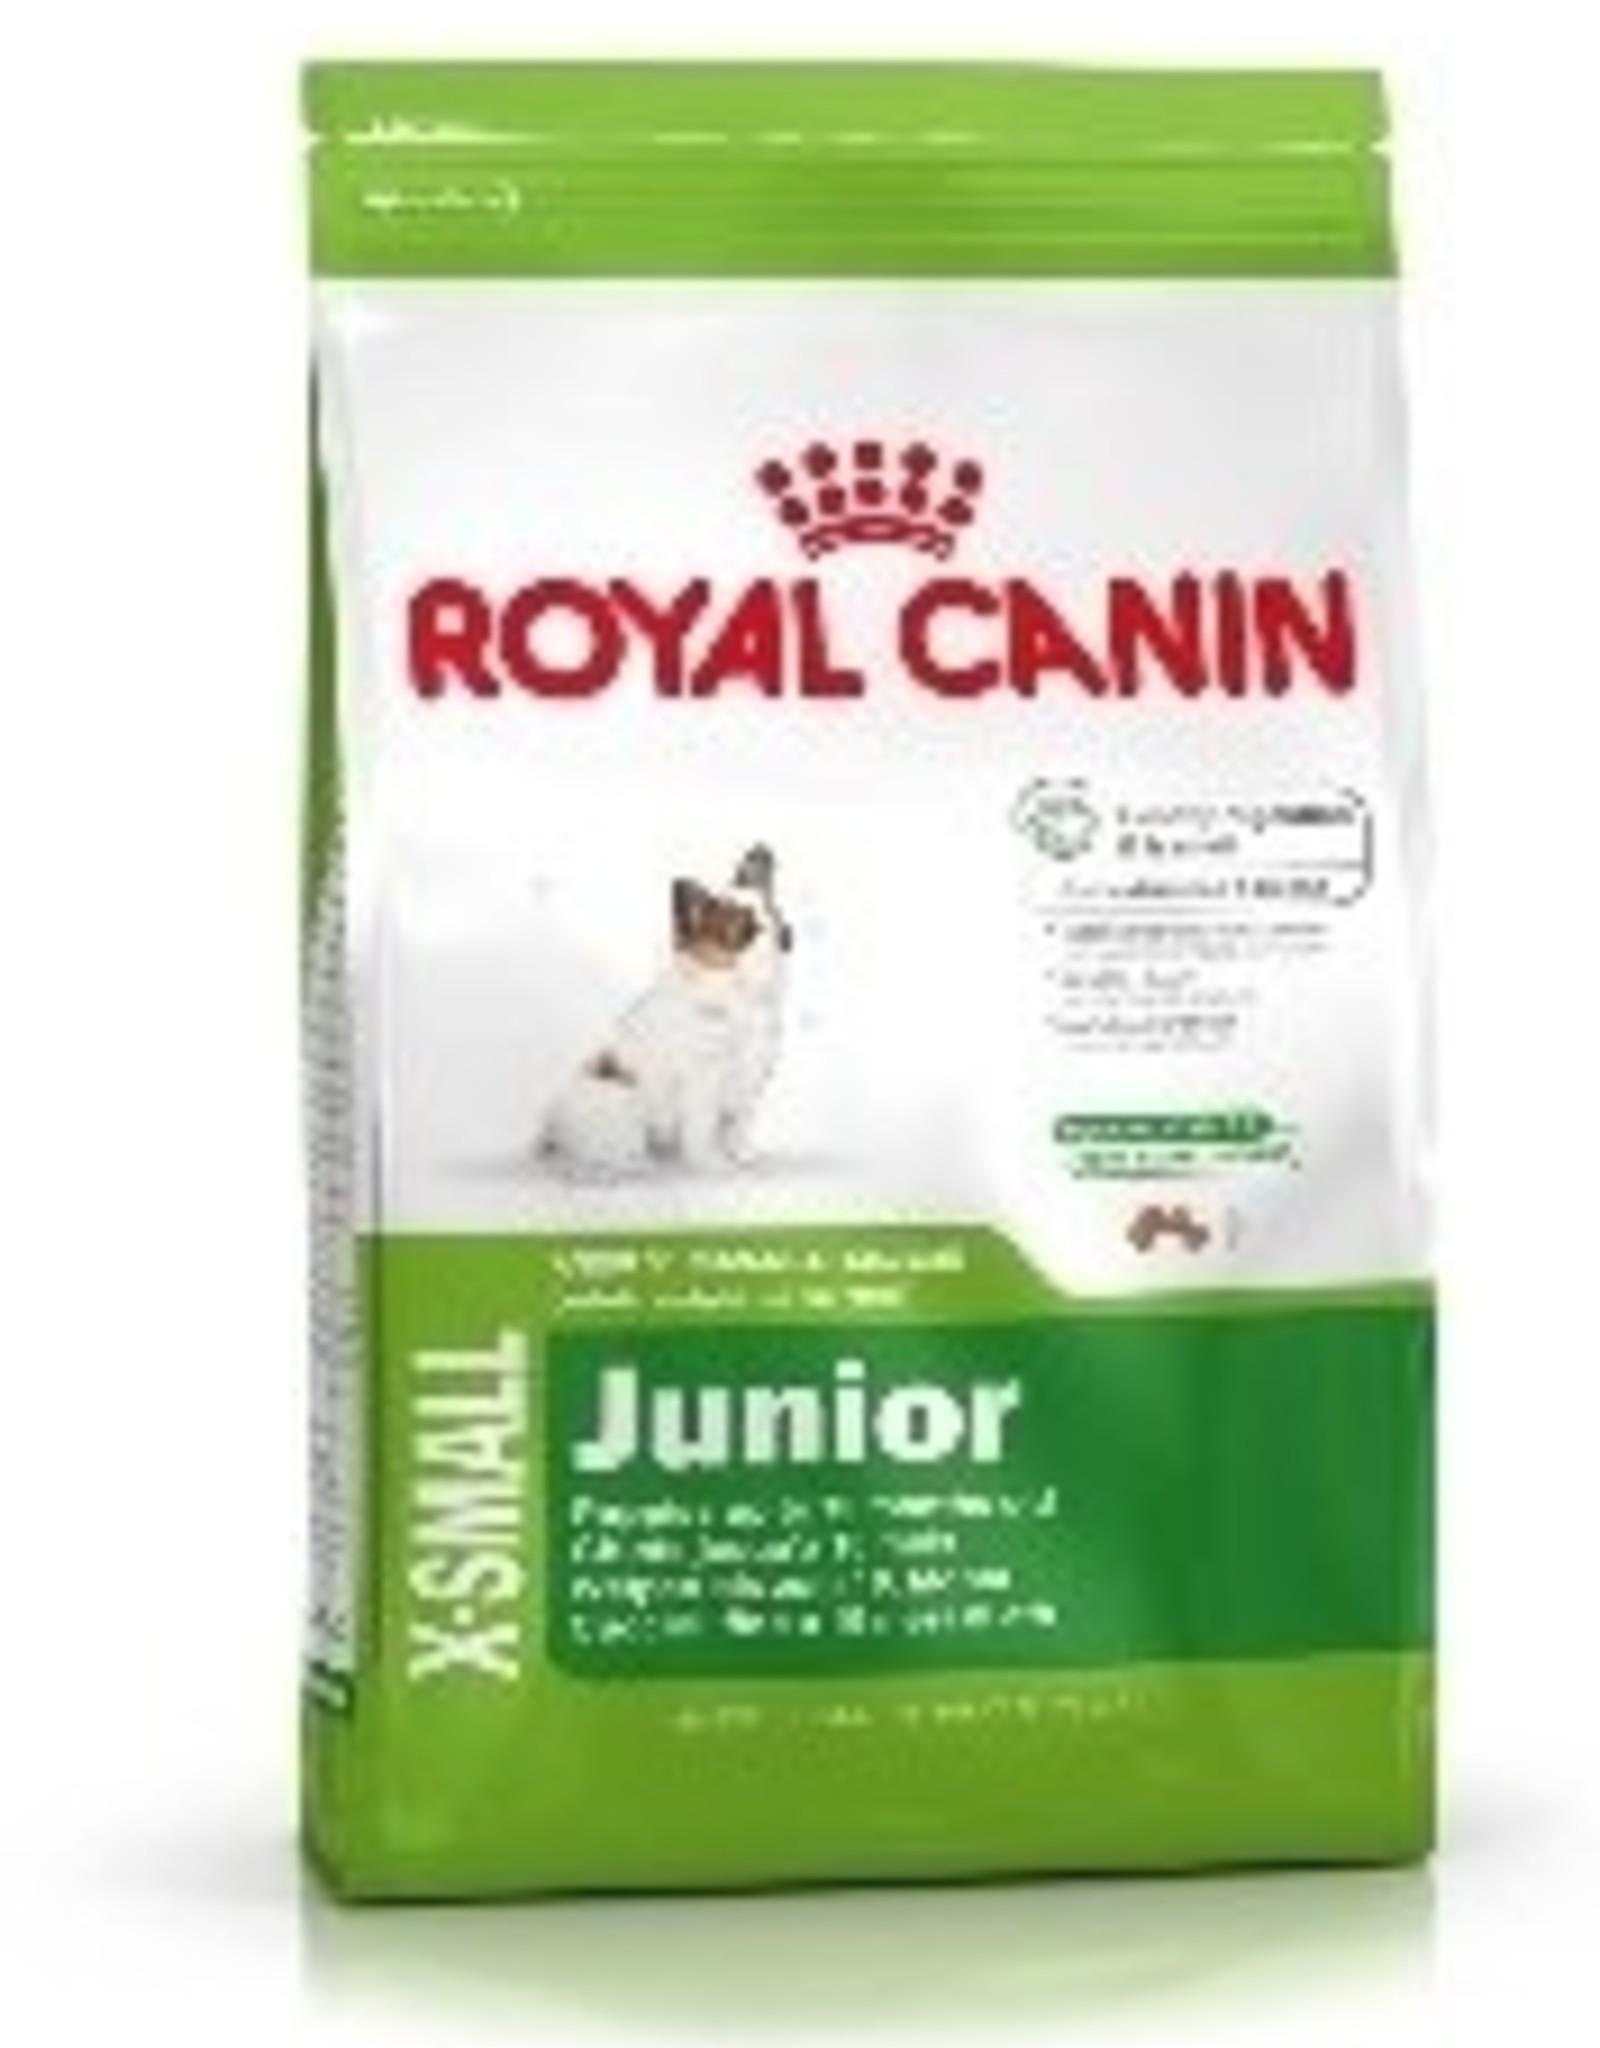 Royal Canin Royal Canin Shn X Small Junior Hond 0,5kg